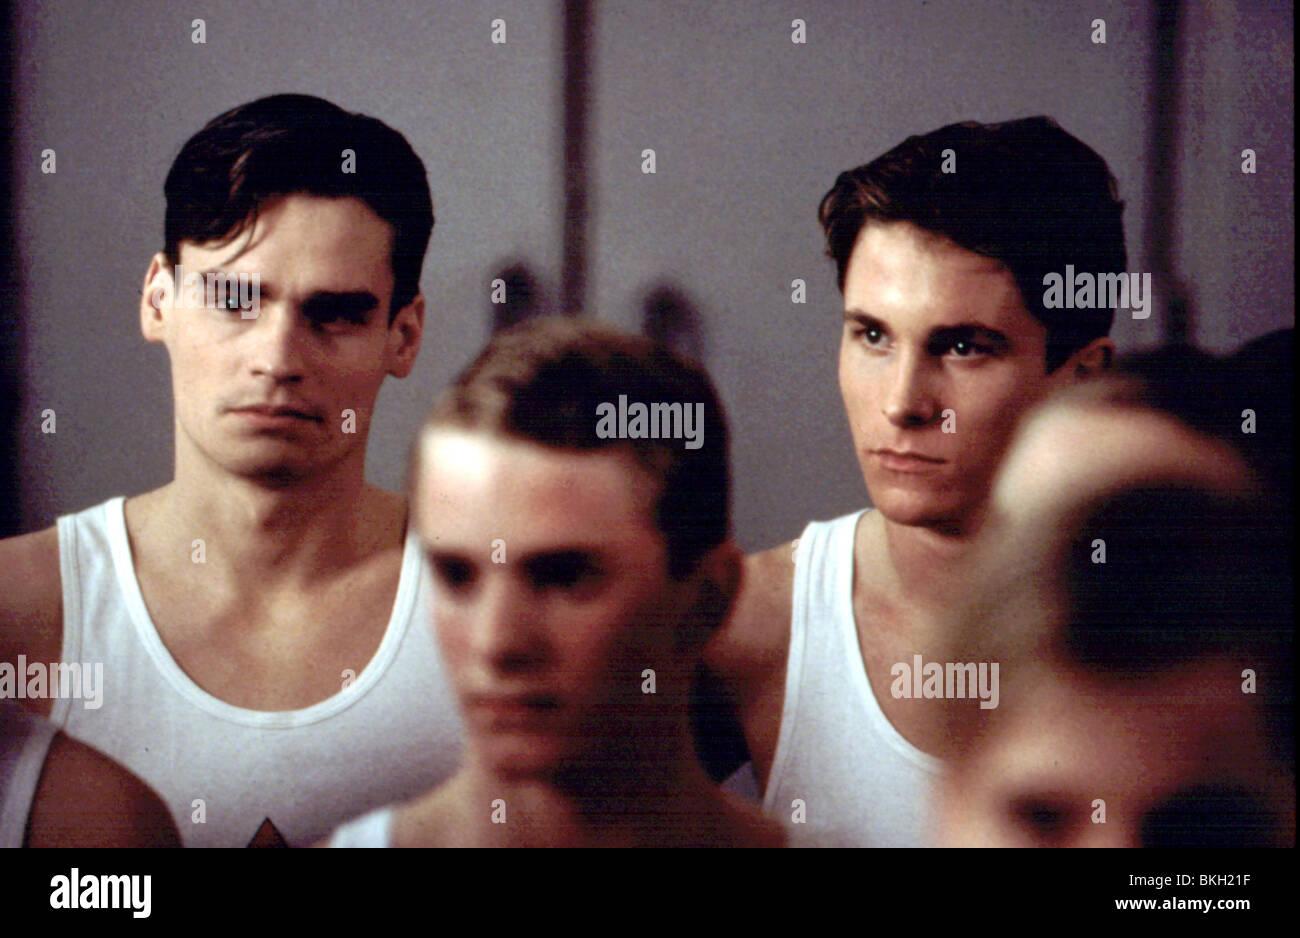 Swing Kids 1993 Robert Sean Leonard Christian Bale Swkd